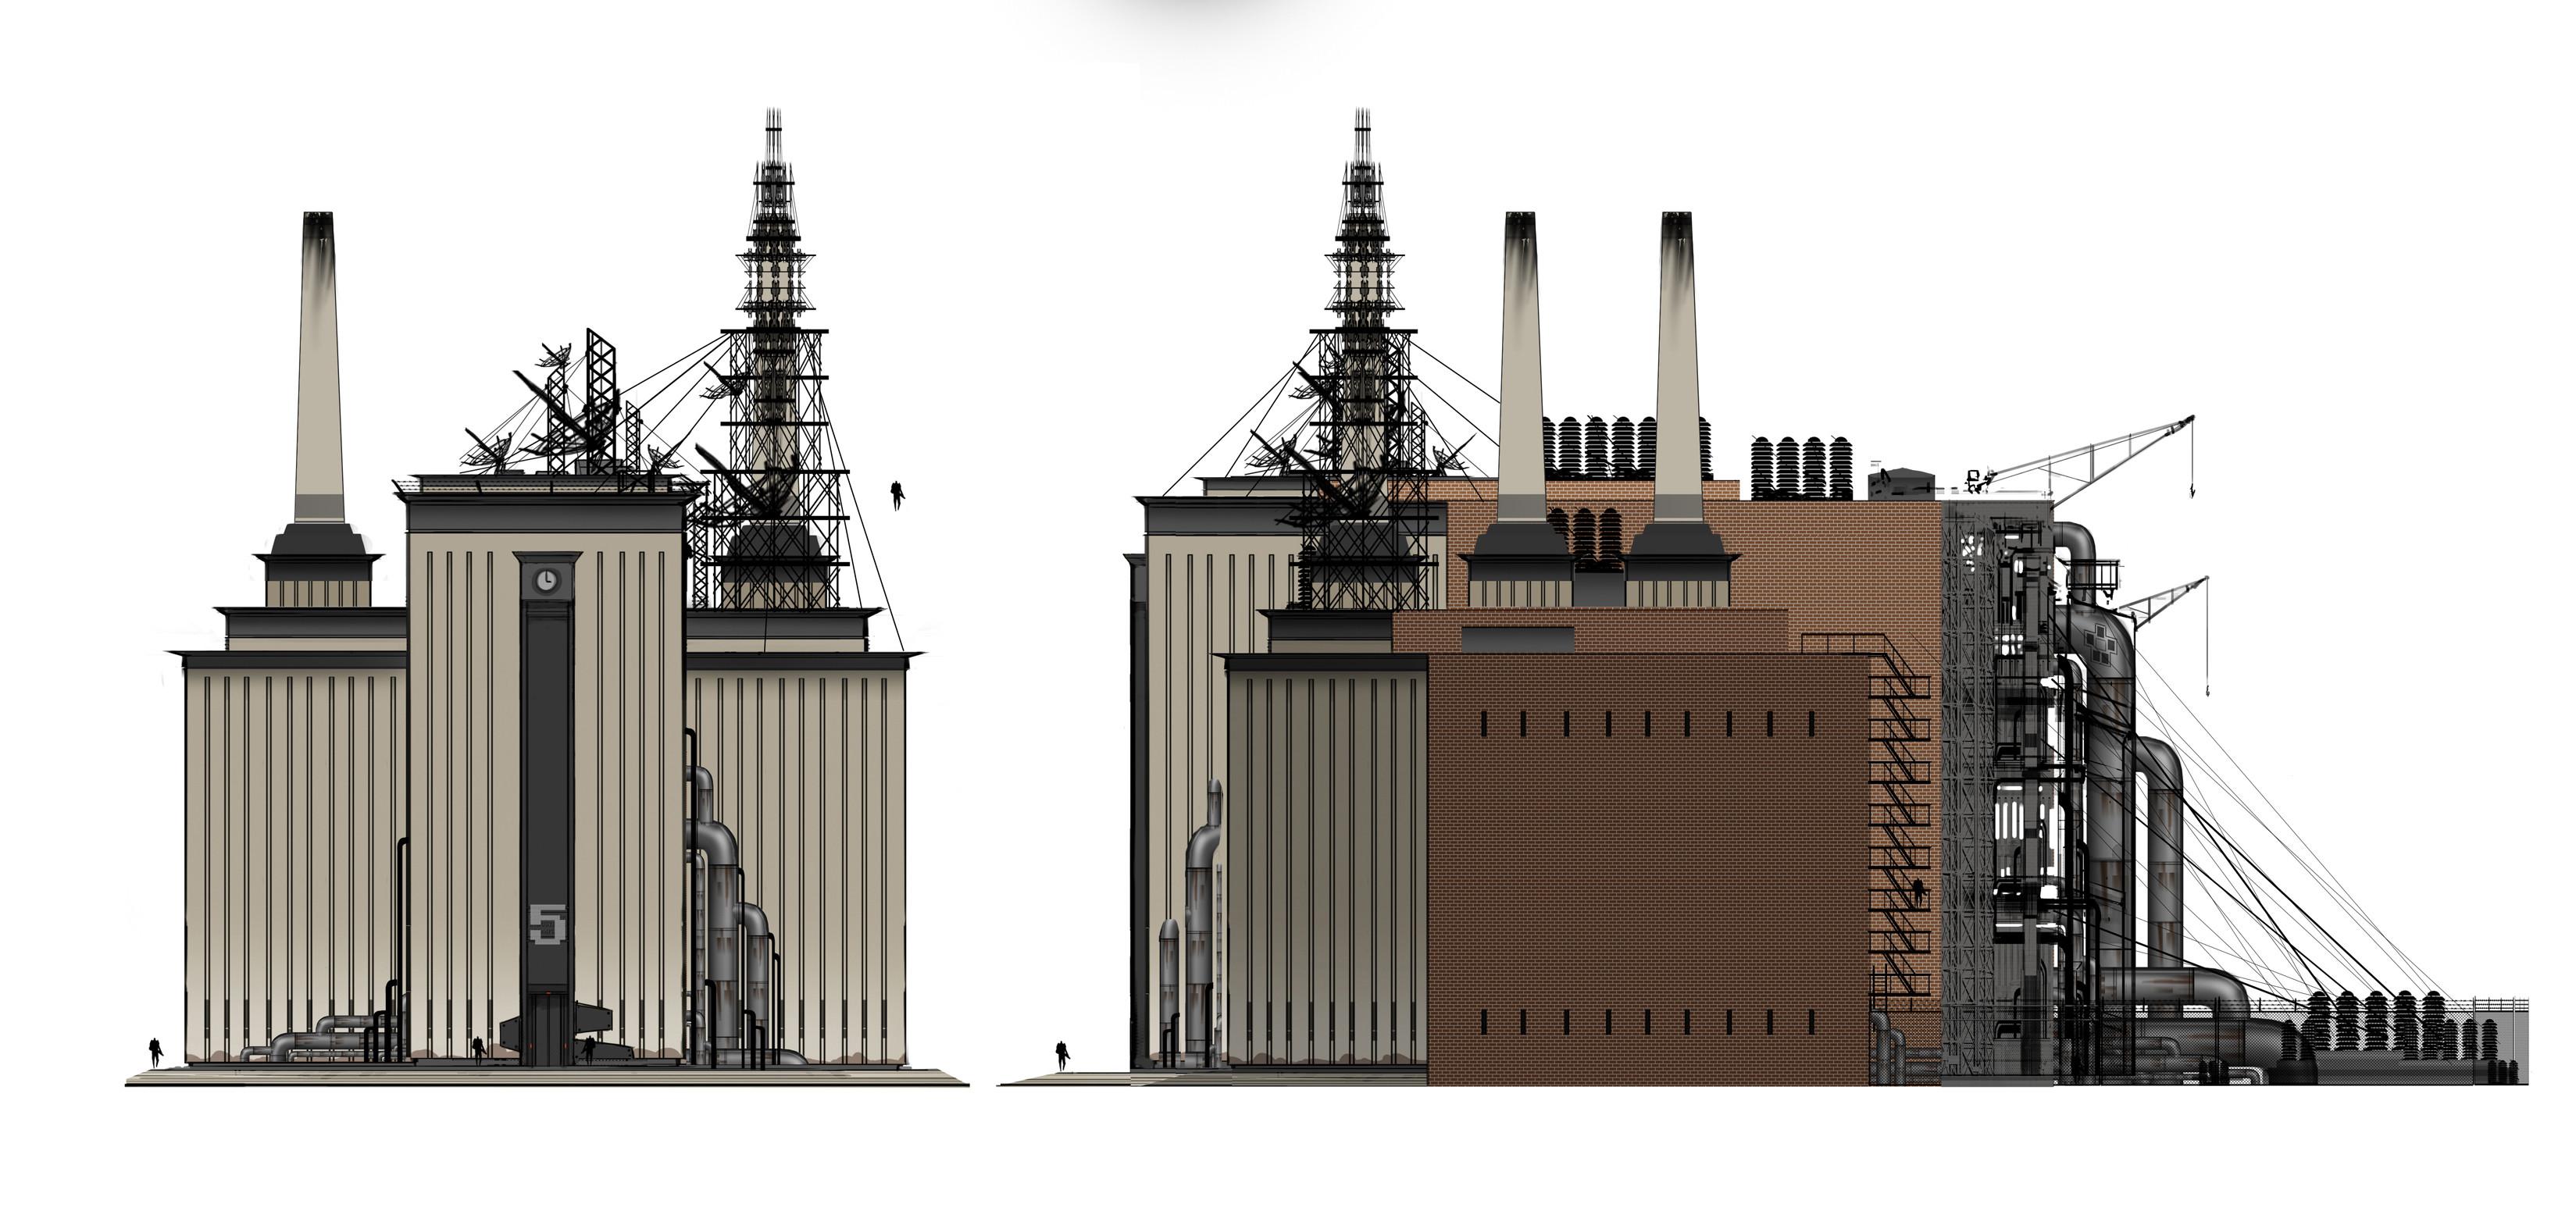 A demo area we built. Power plant.